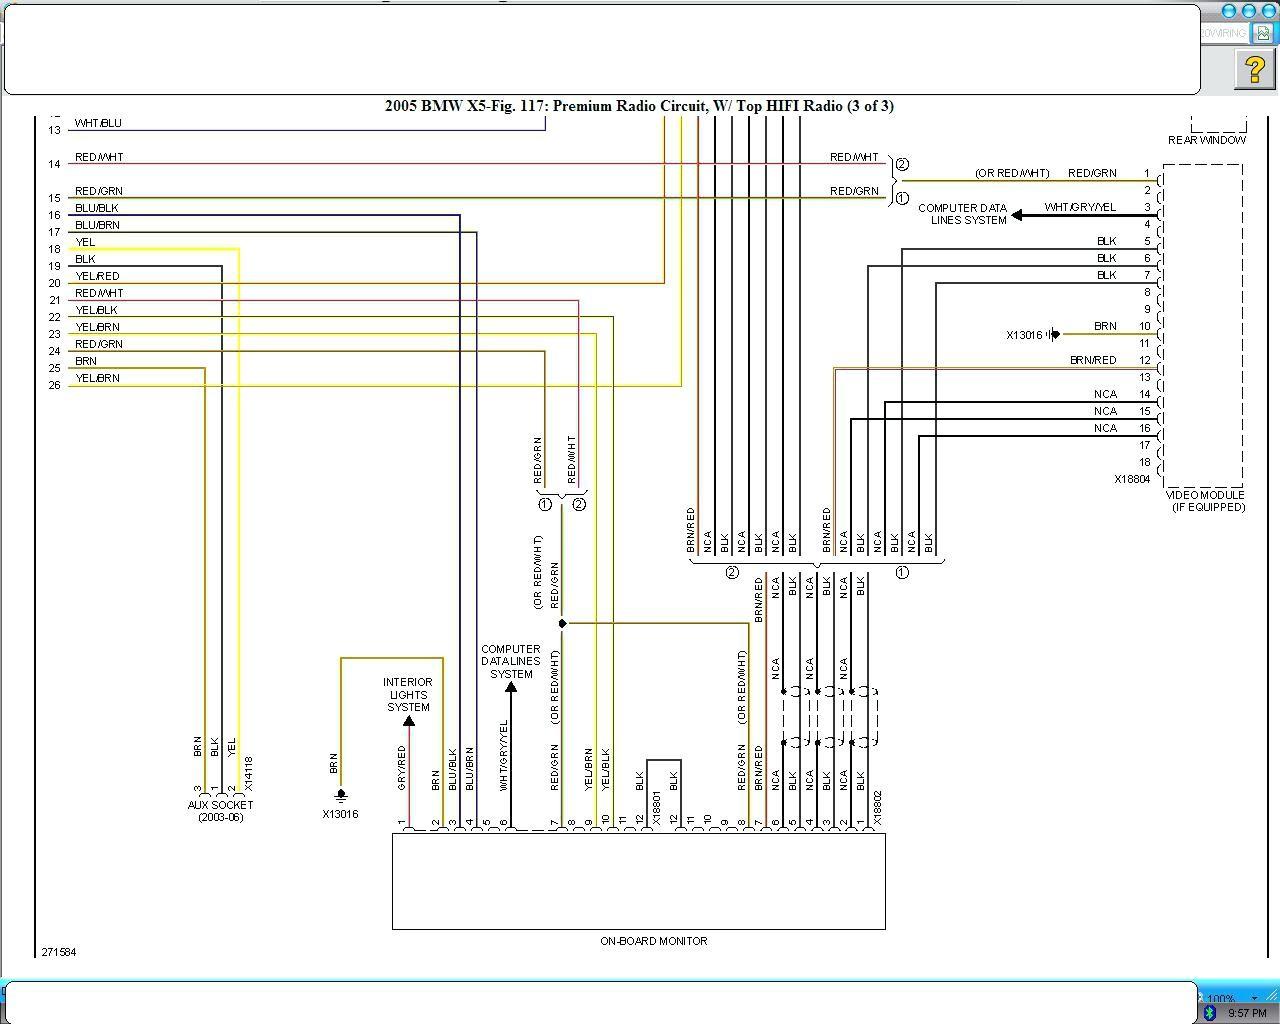 Astonishing 2001 Bmw 328I Radio Wiring Diagram Wiring Diagram Data Wiring Cloud Hisonepsysticxongrecoveryedborg